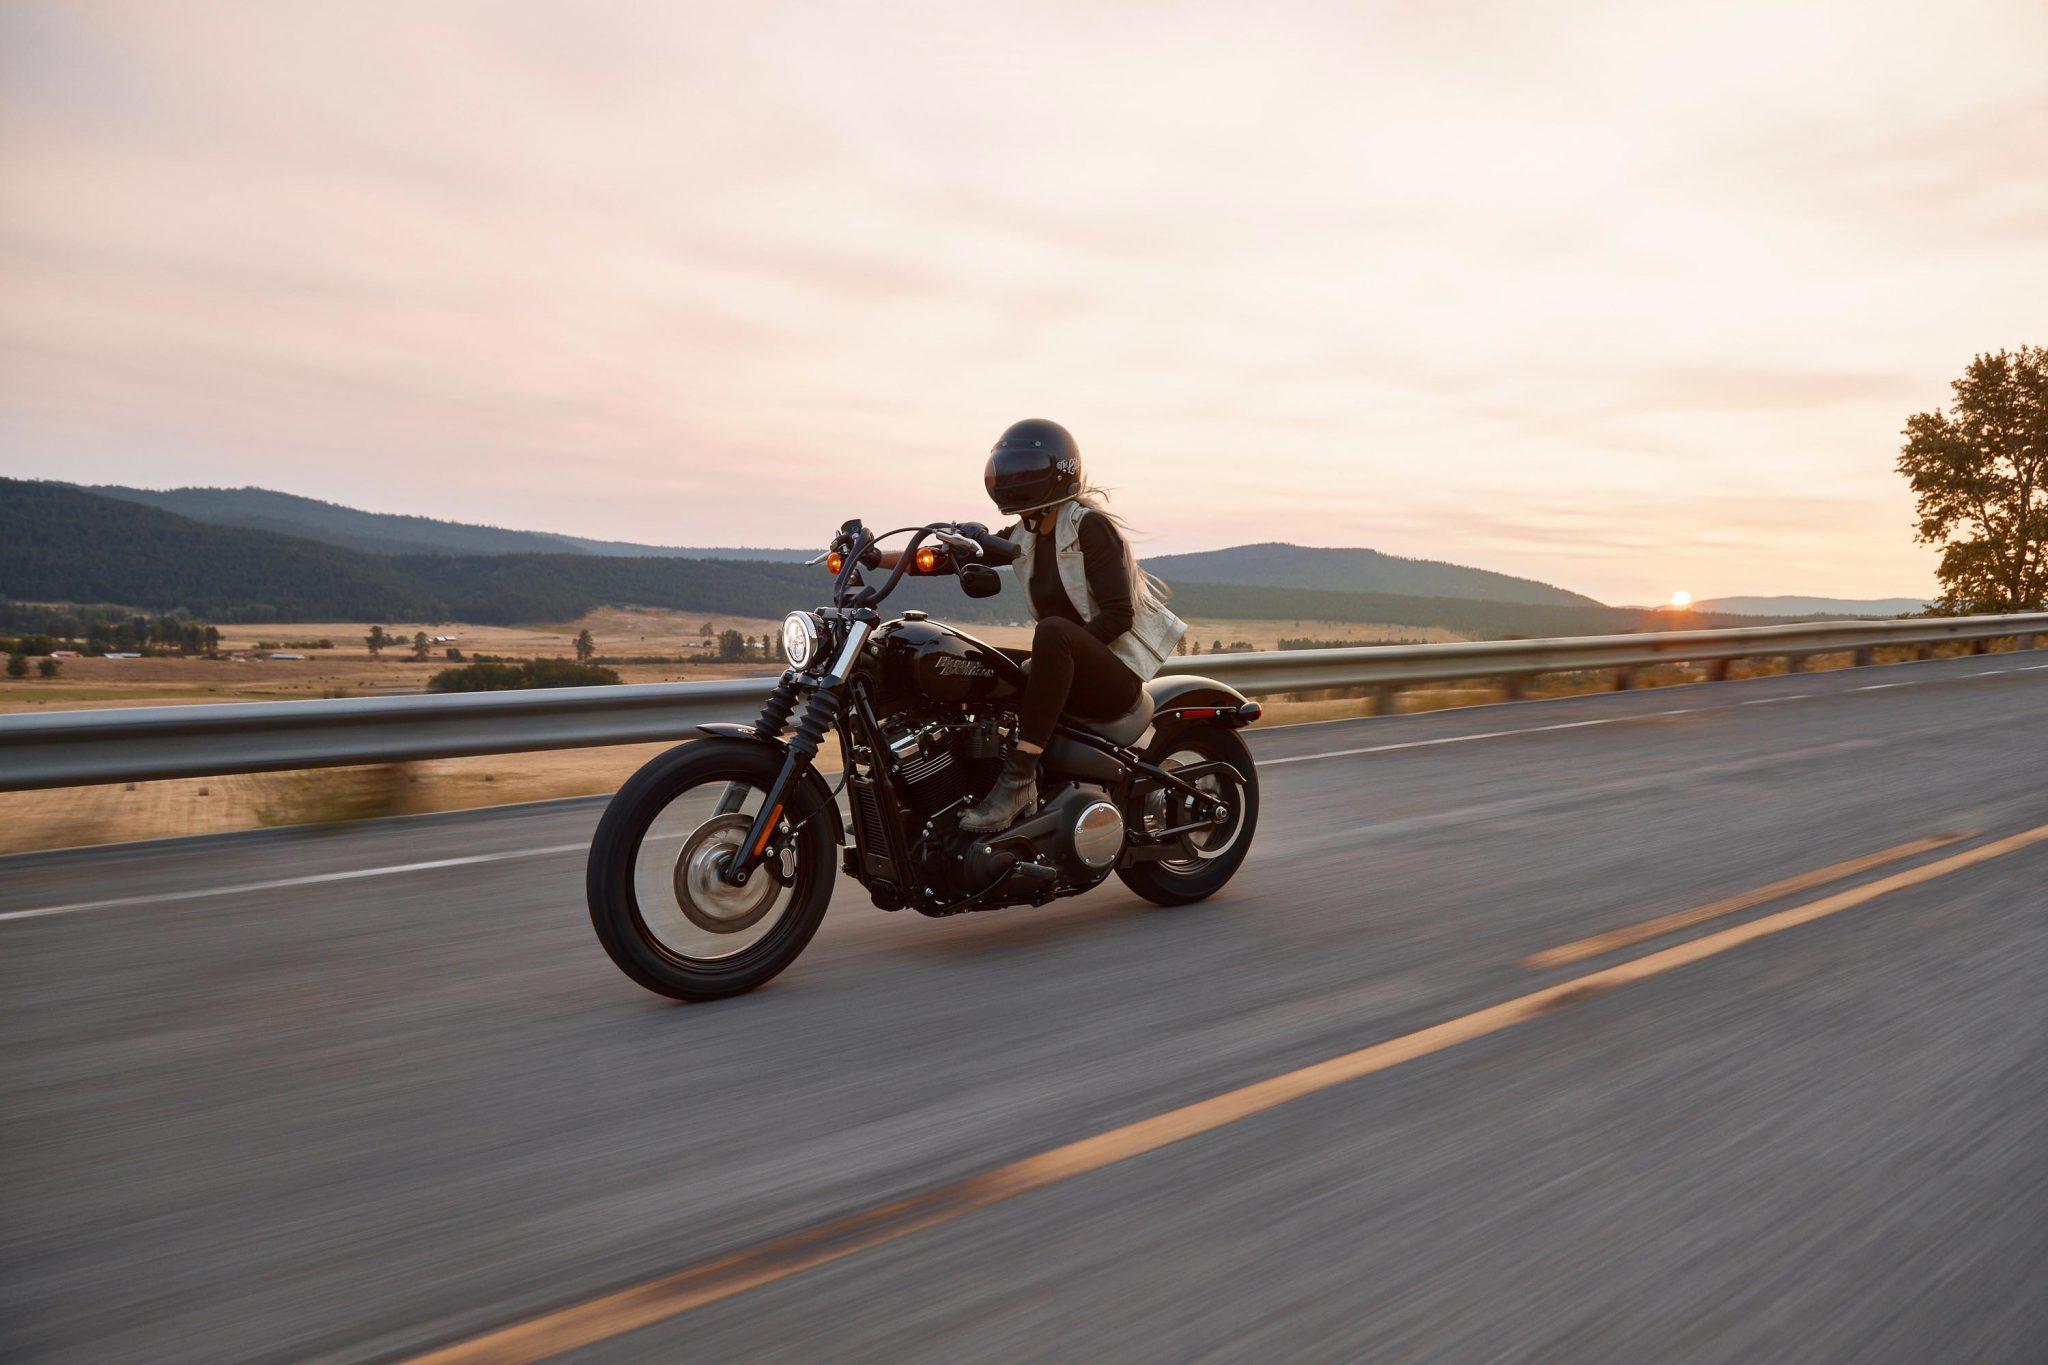 ukmoto import moto moto occasion moto anglaise moto angleterre 281 - RESERVER UNE INSPECTION MOTO PAR VOTRE MANDATAIRE MOTO UKMOTO